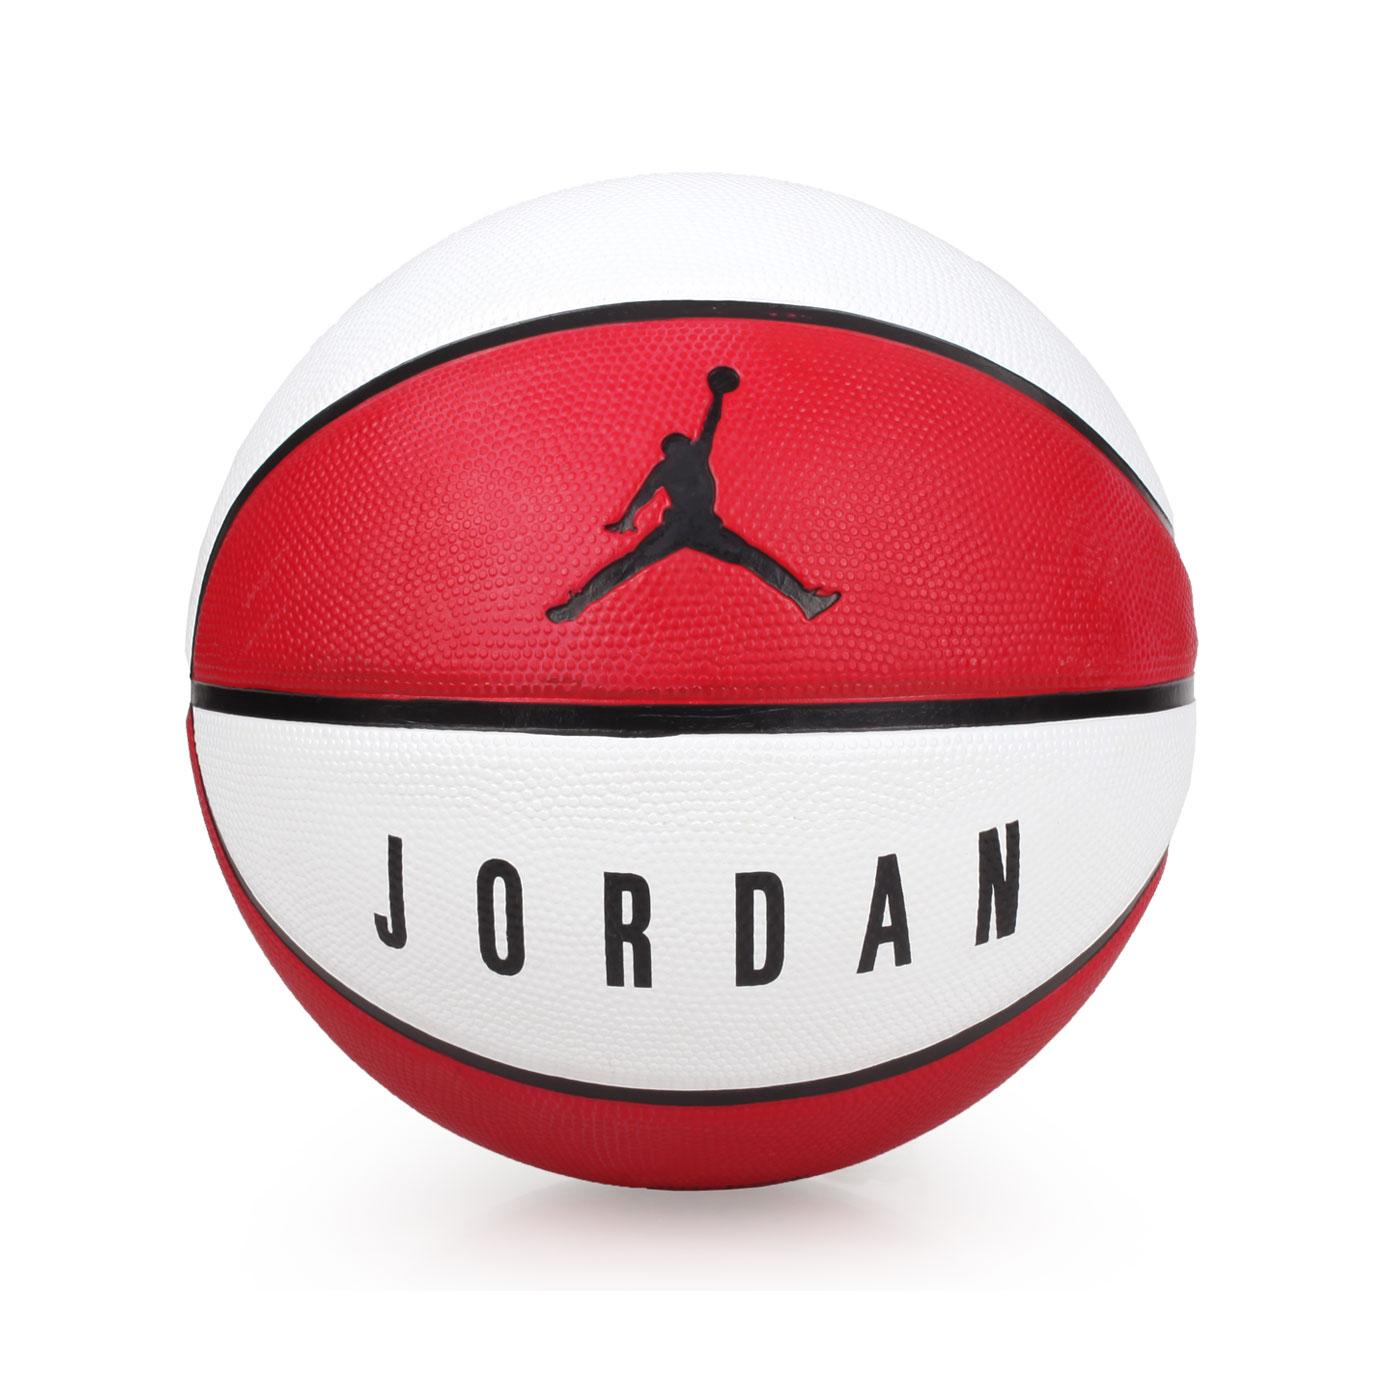 NIKE JORDAN PLAYGROUND 8P 7號籃球 J000186504107 - 紅白黑